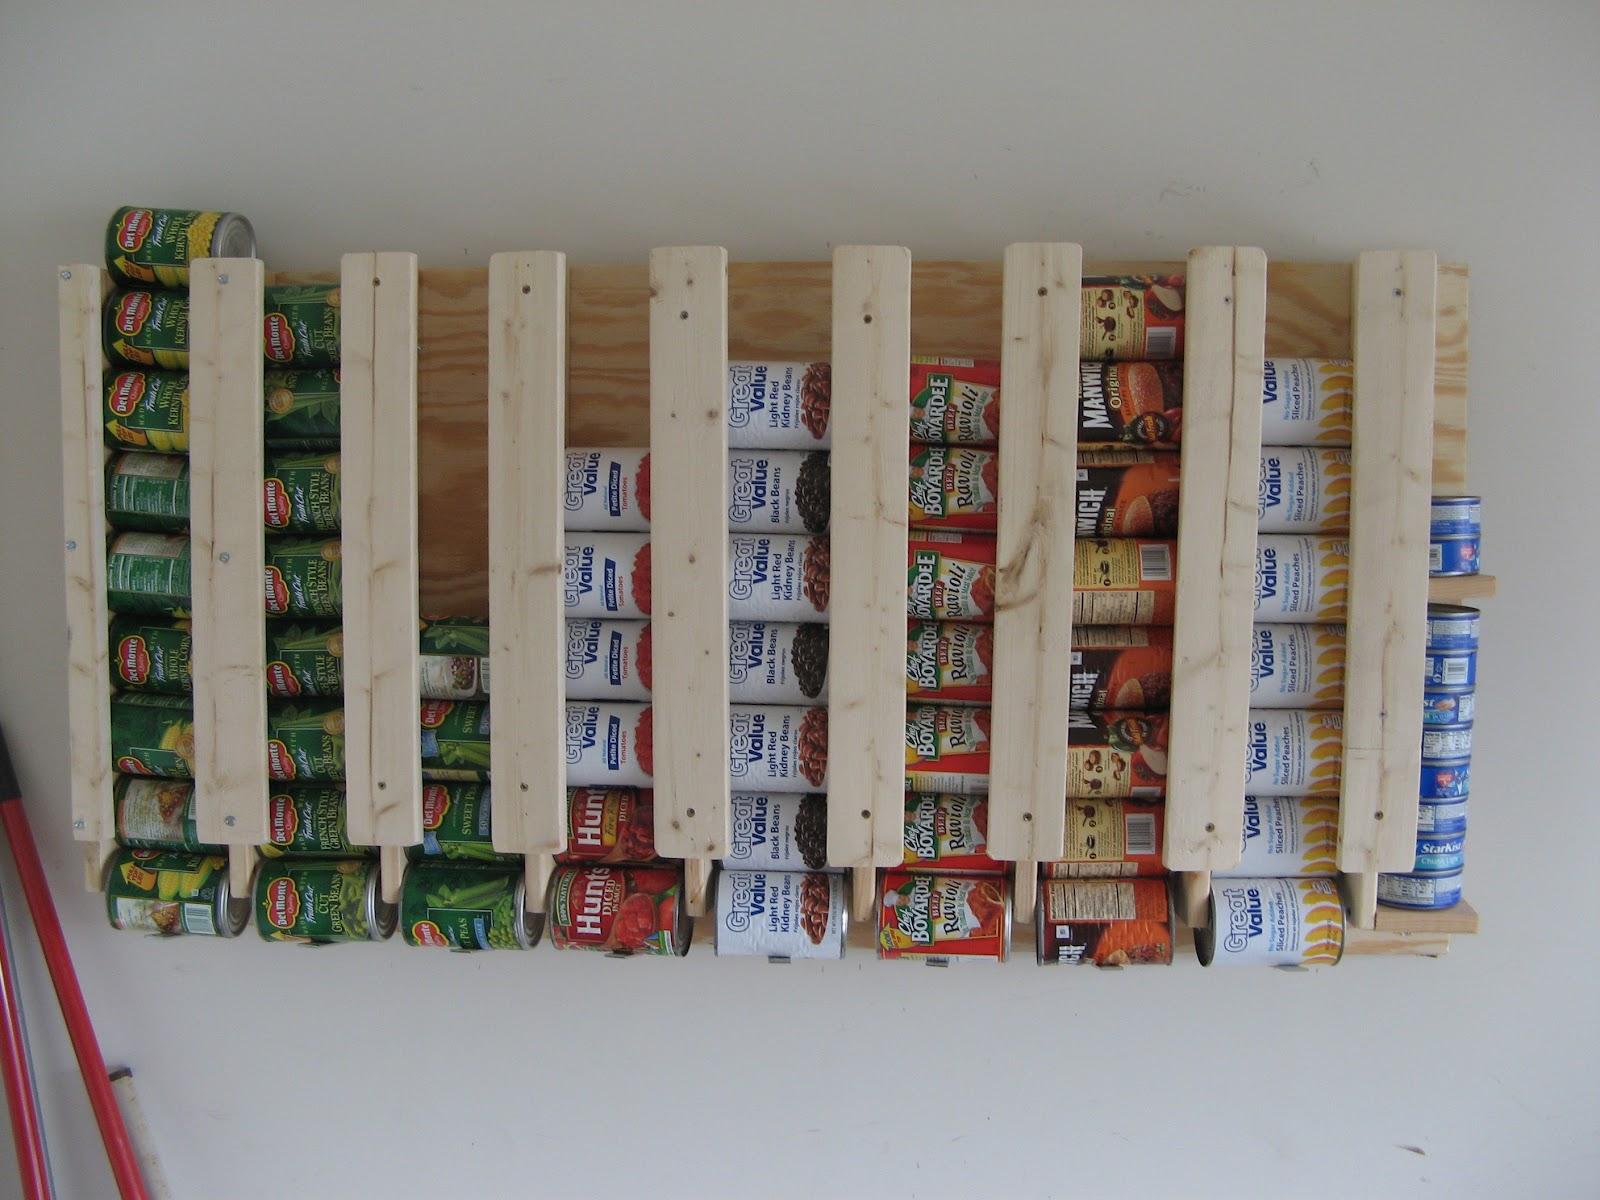 DIY Canned Food Storage Rack | Creative Canned Food Storage Ideas